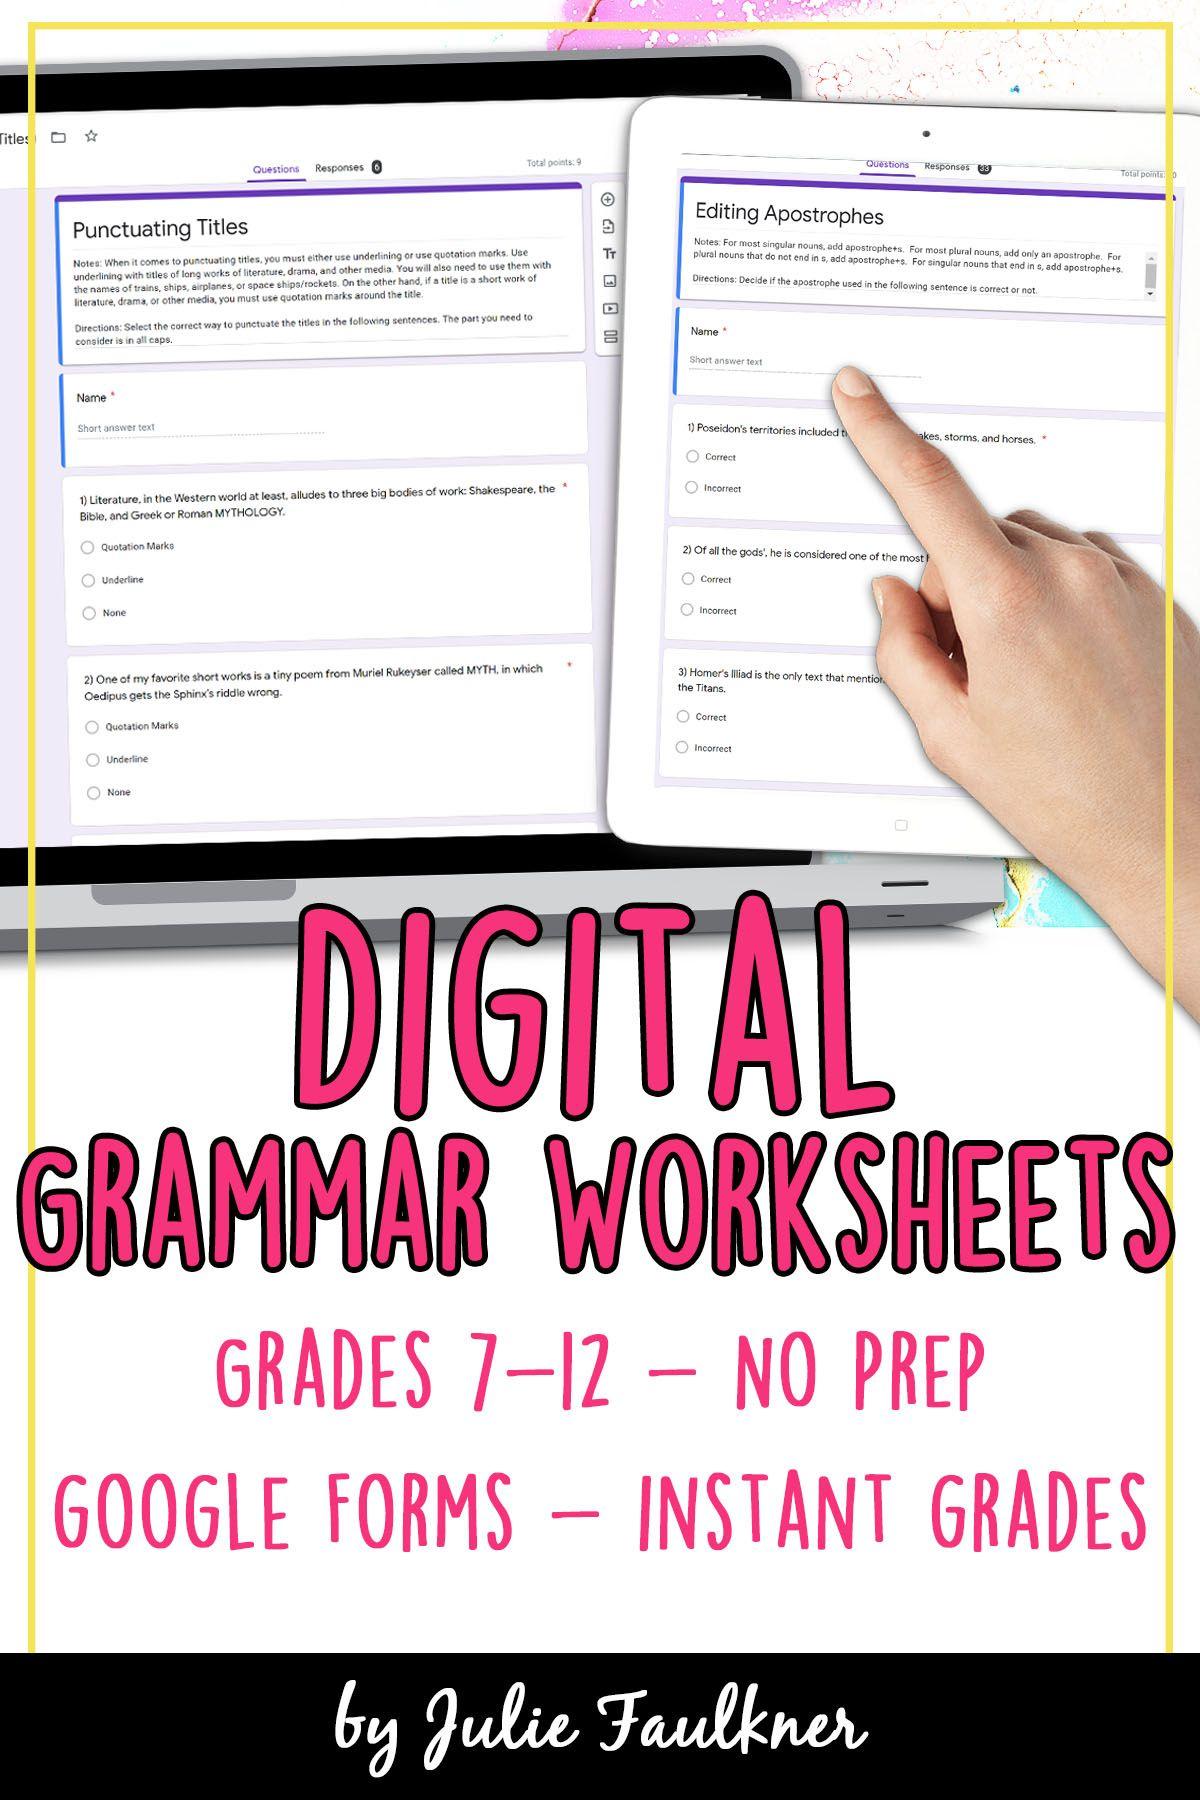 Digital Grammar Exercises In